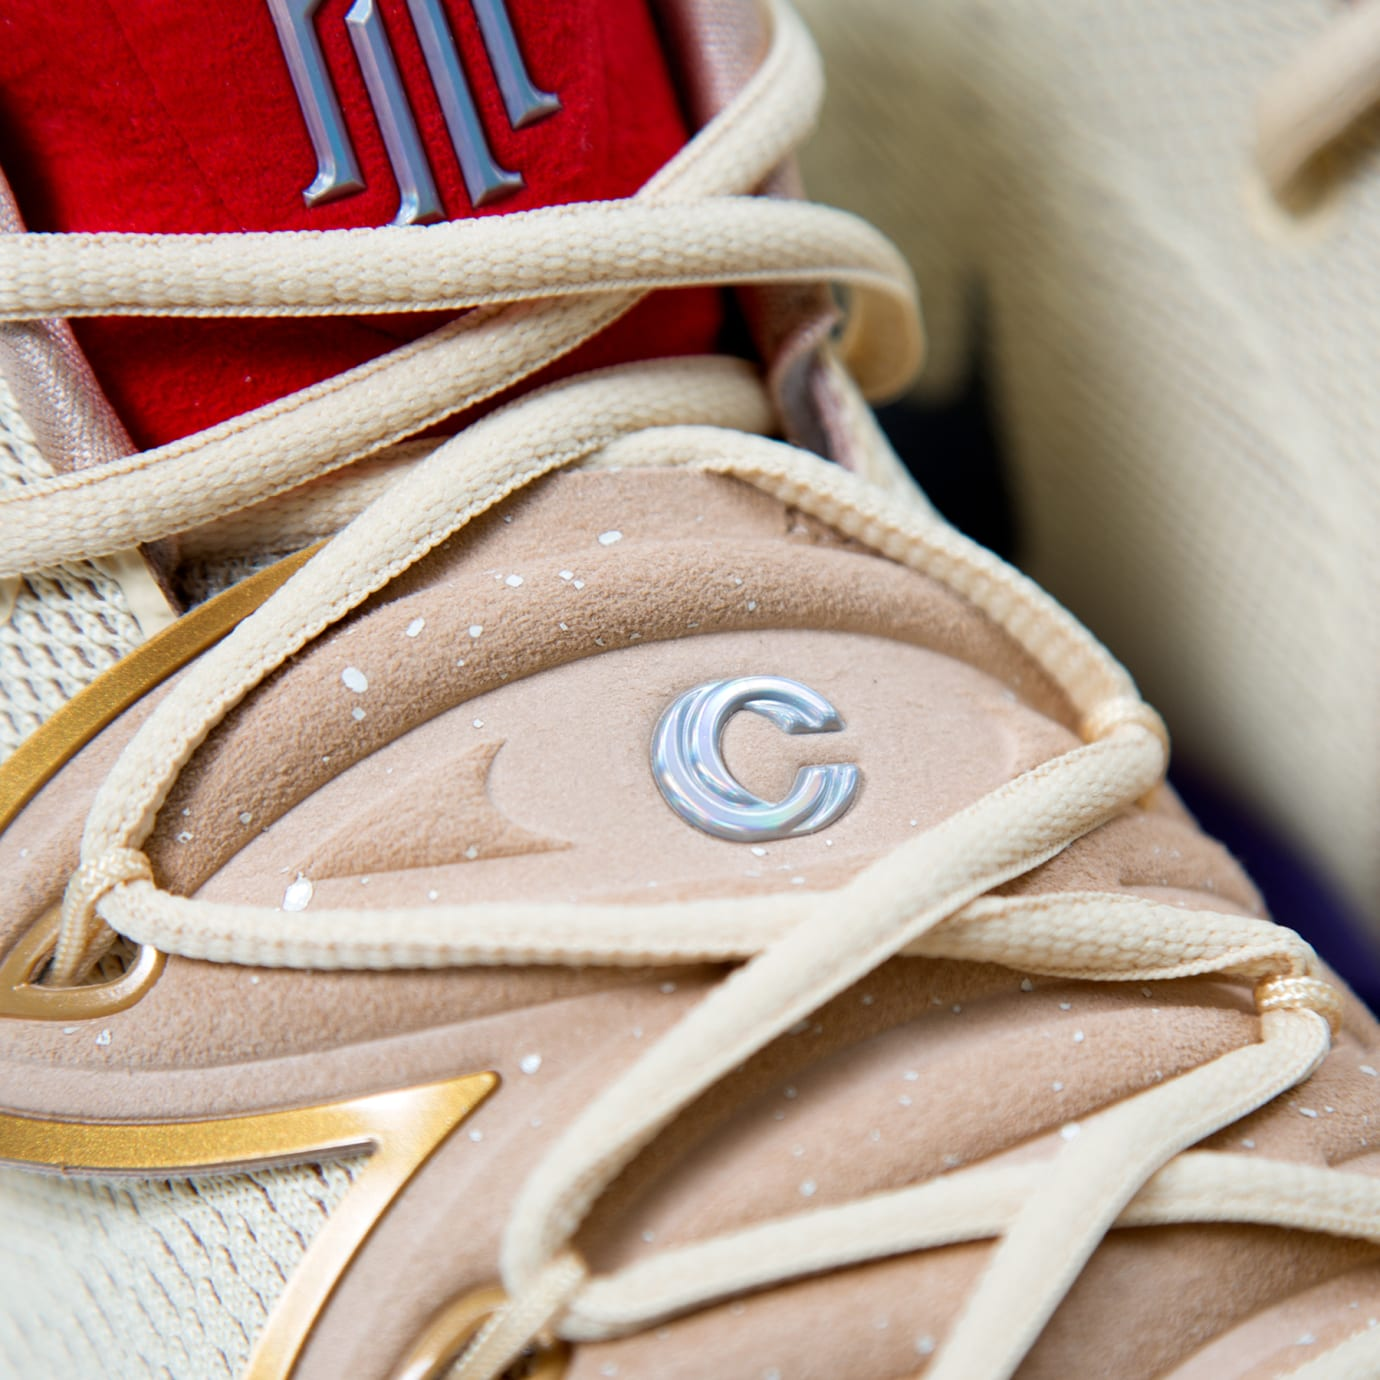 Concepts x Nike Kyrie 5 'Ikhet' (Detail)